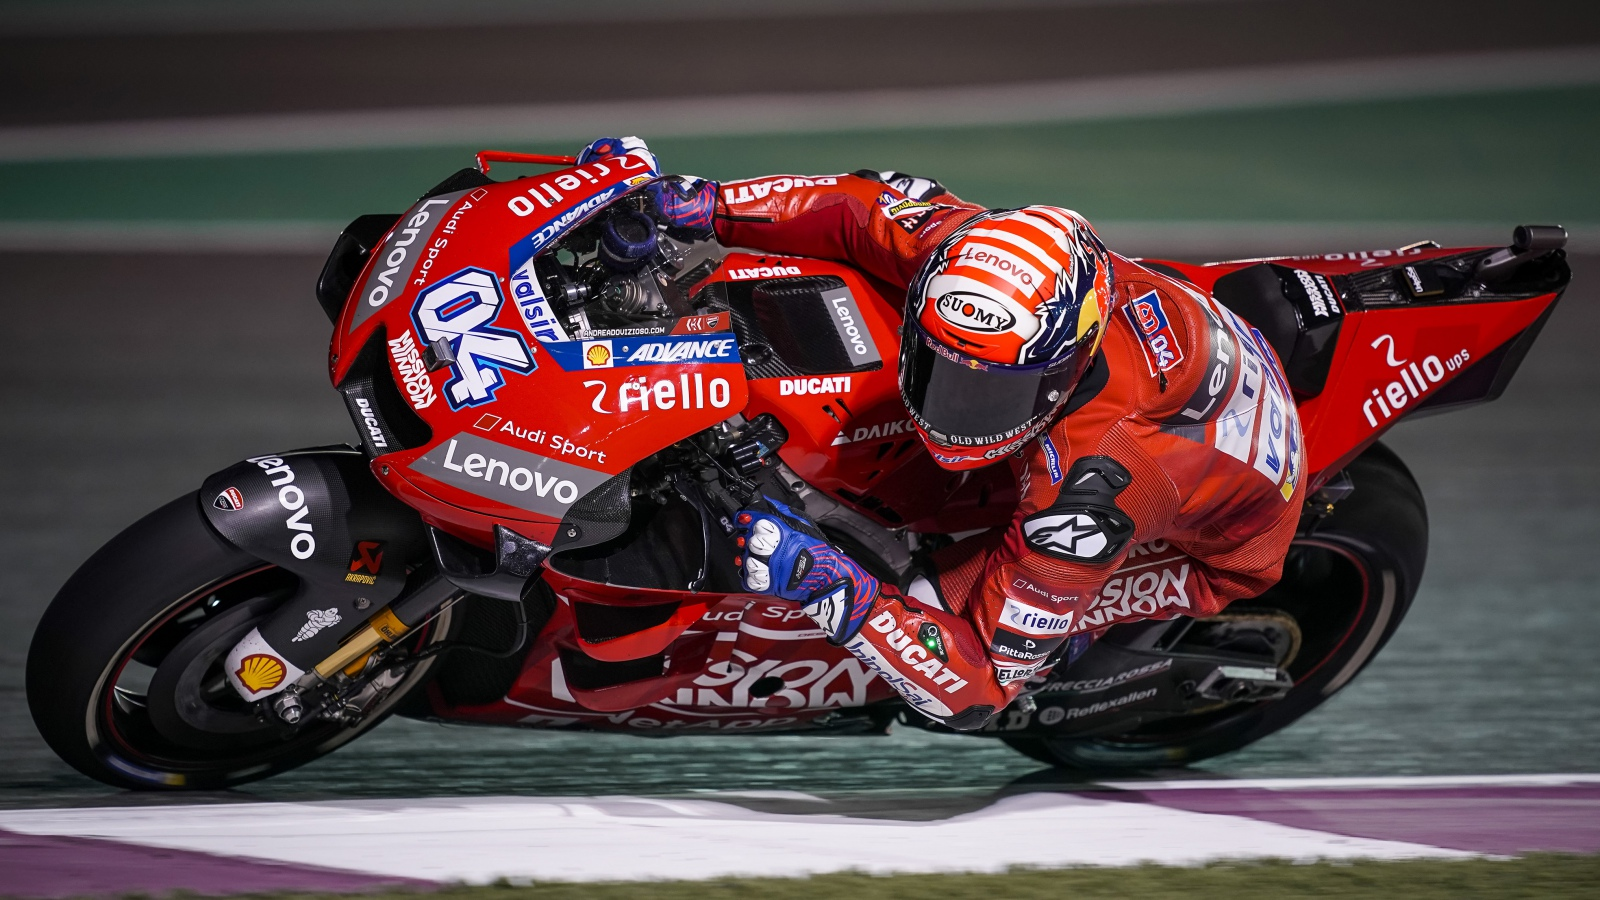 Andrea Dovizioso se impone a Marc Márquez en Qatar con un espectacular déjà vu